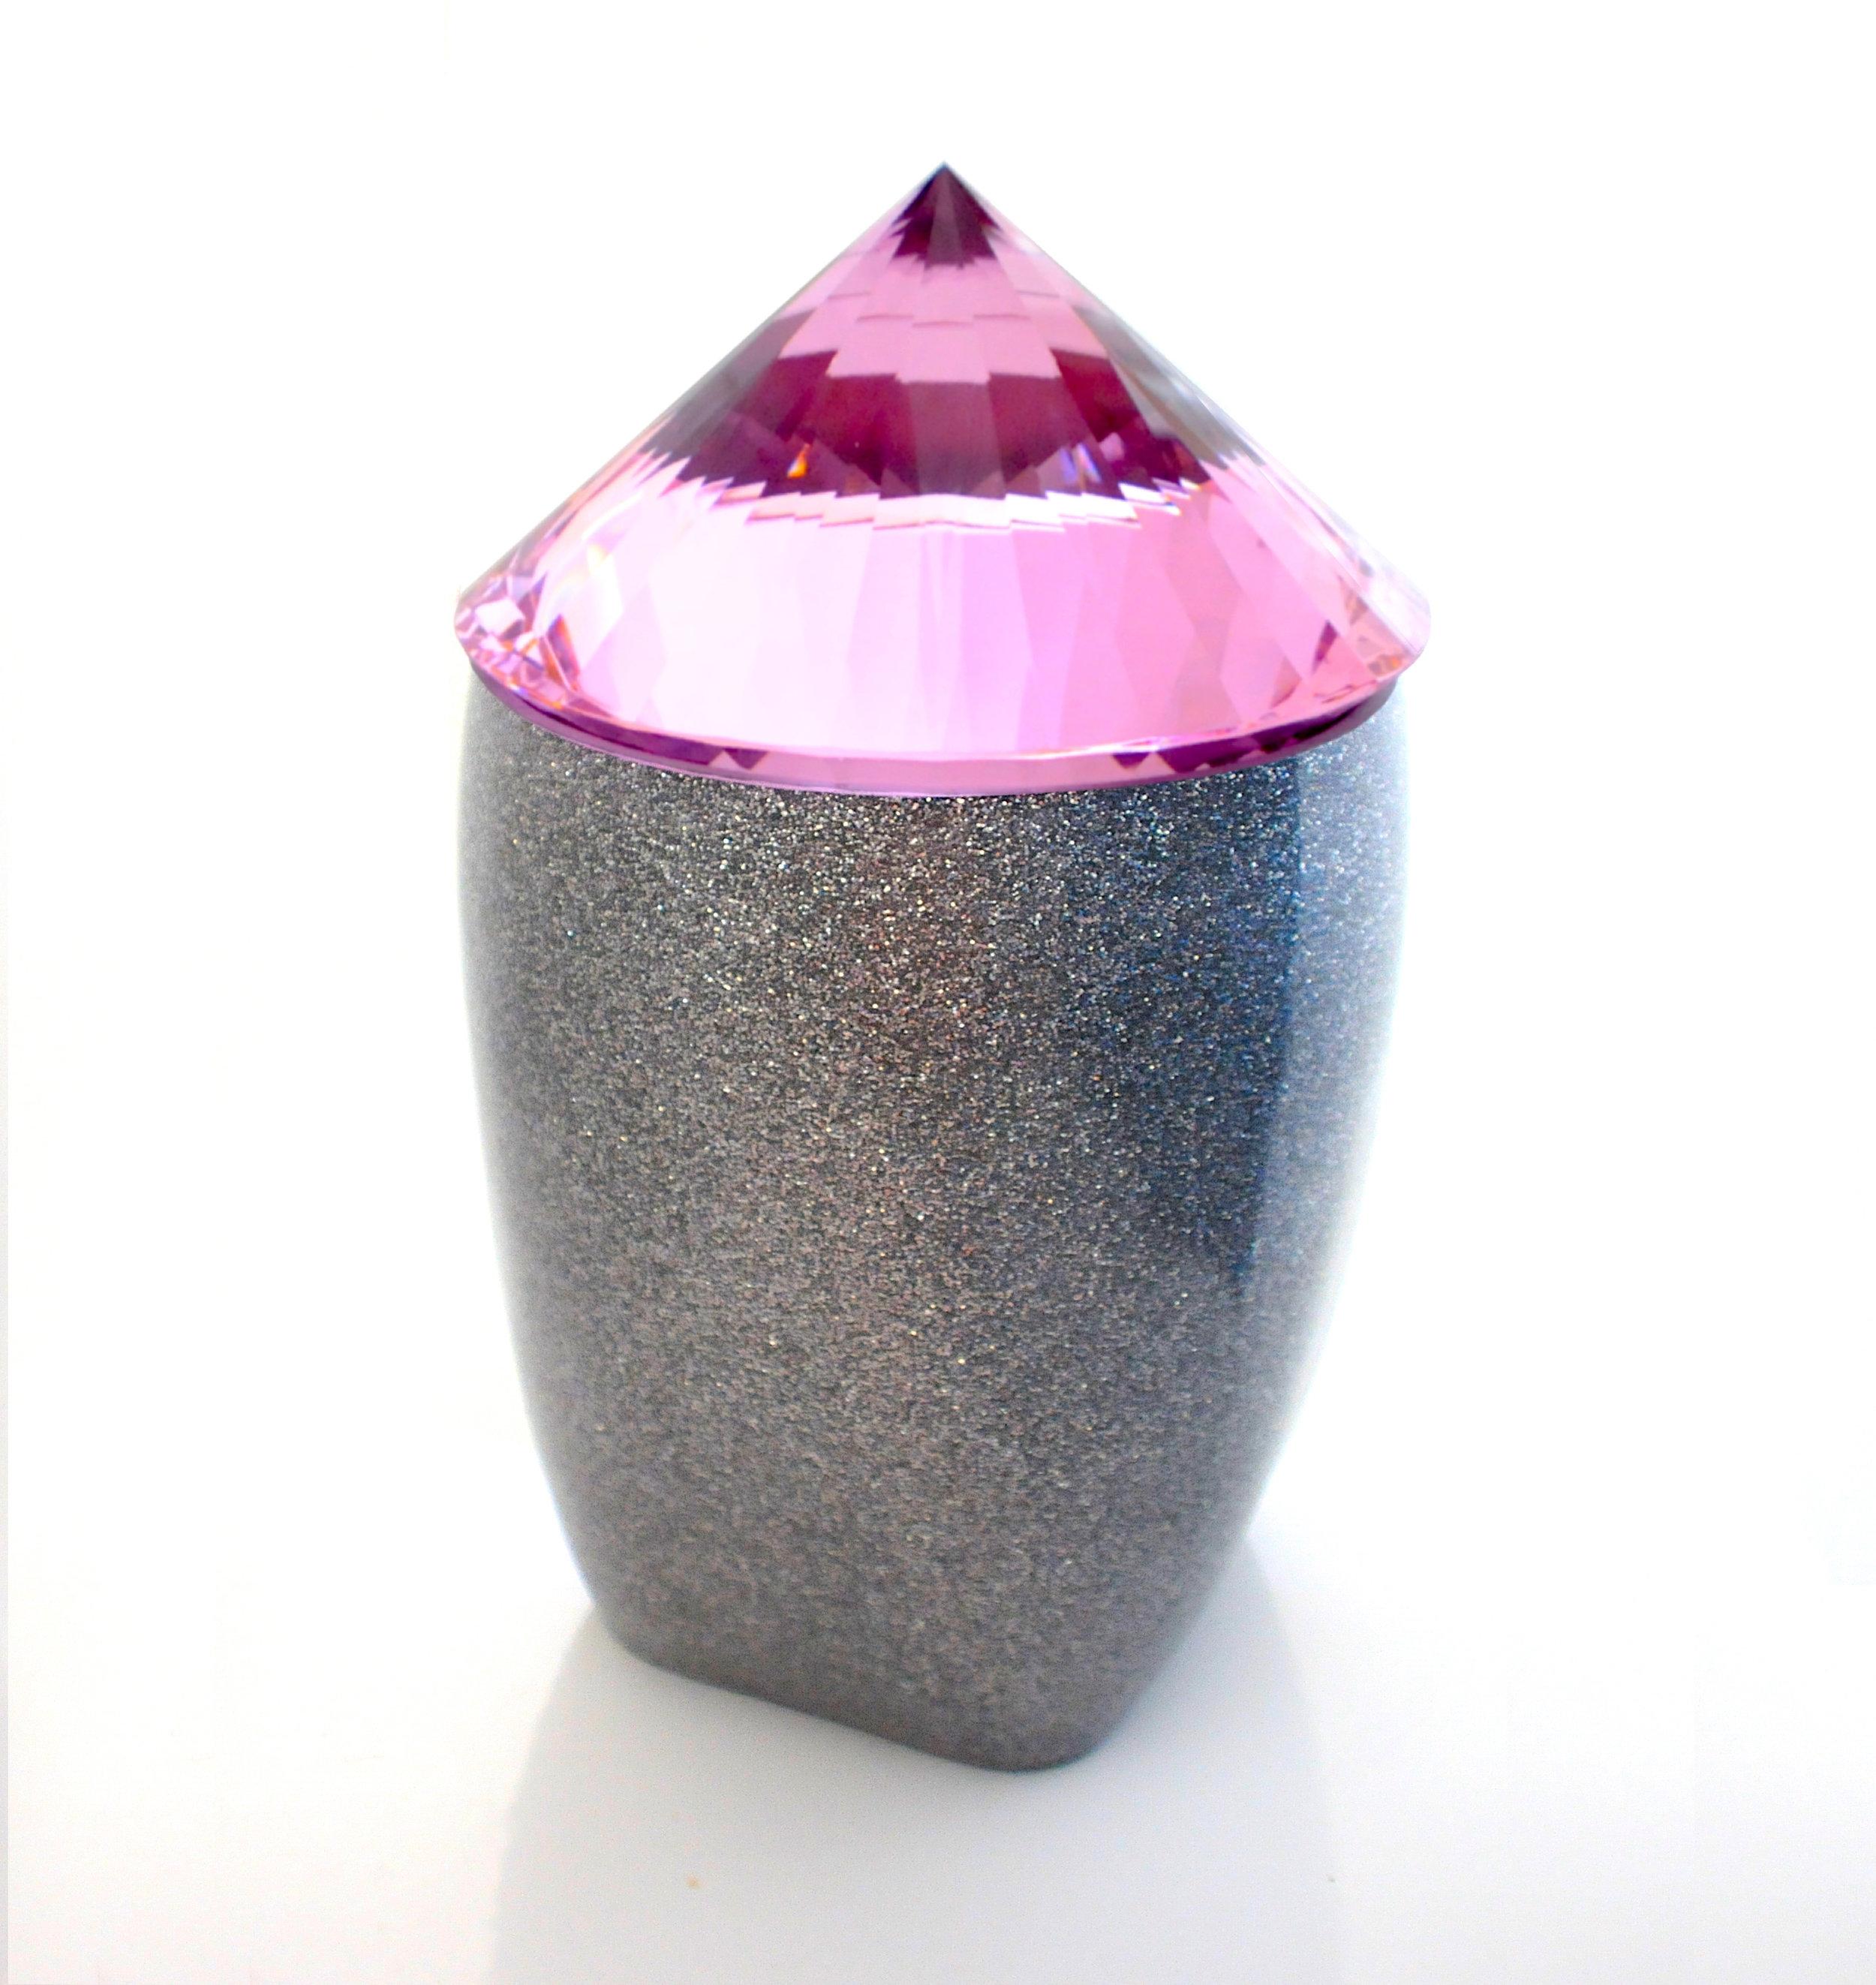 Zundel De Freitas  Pink Caldron (Caldron Series No.2), 2018 Glass, Metal, Plastic, Acrylic, Lacquer 36 x 20 x 20 cm 1.400 EUR